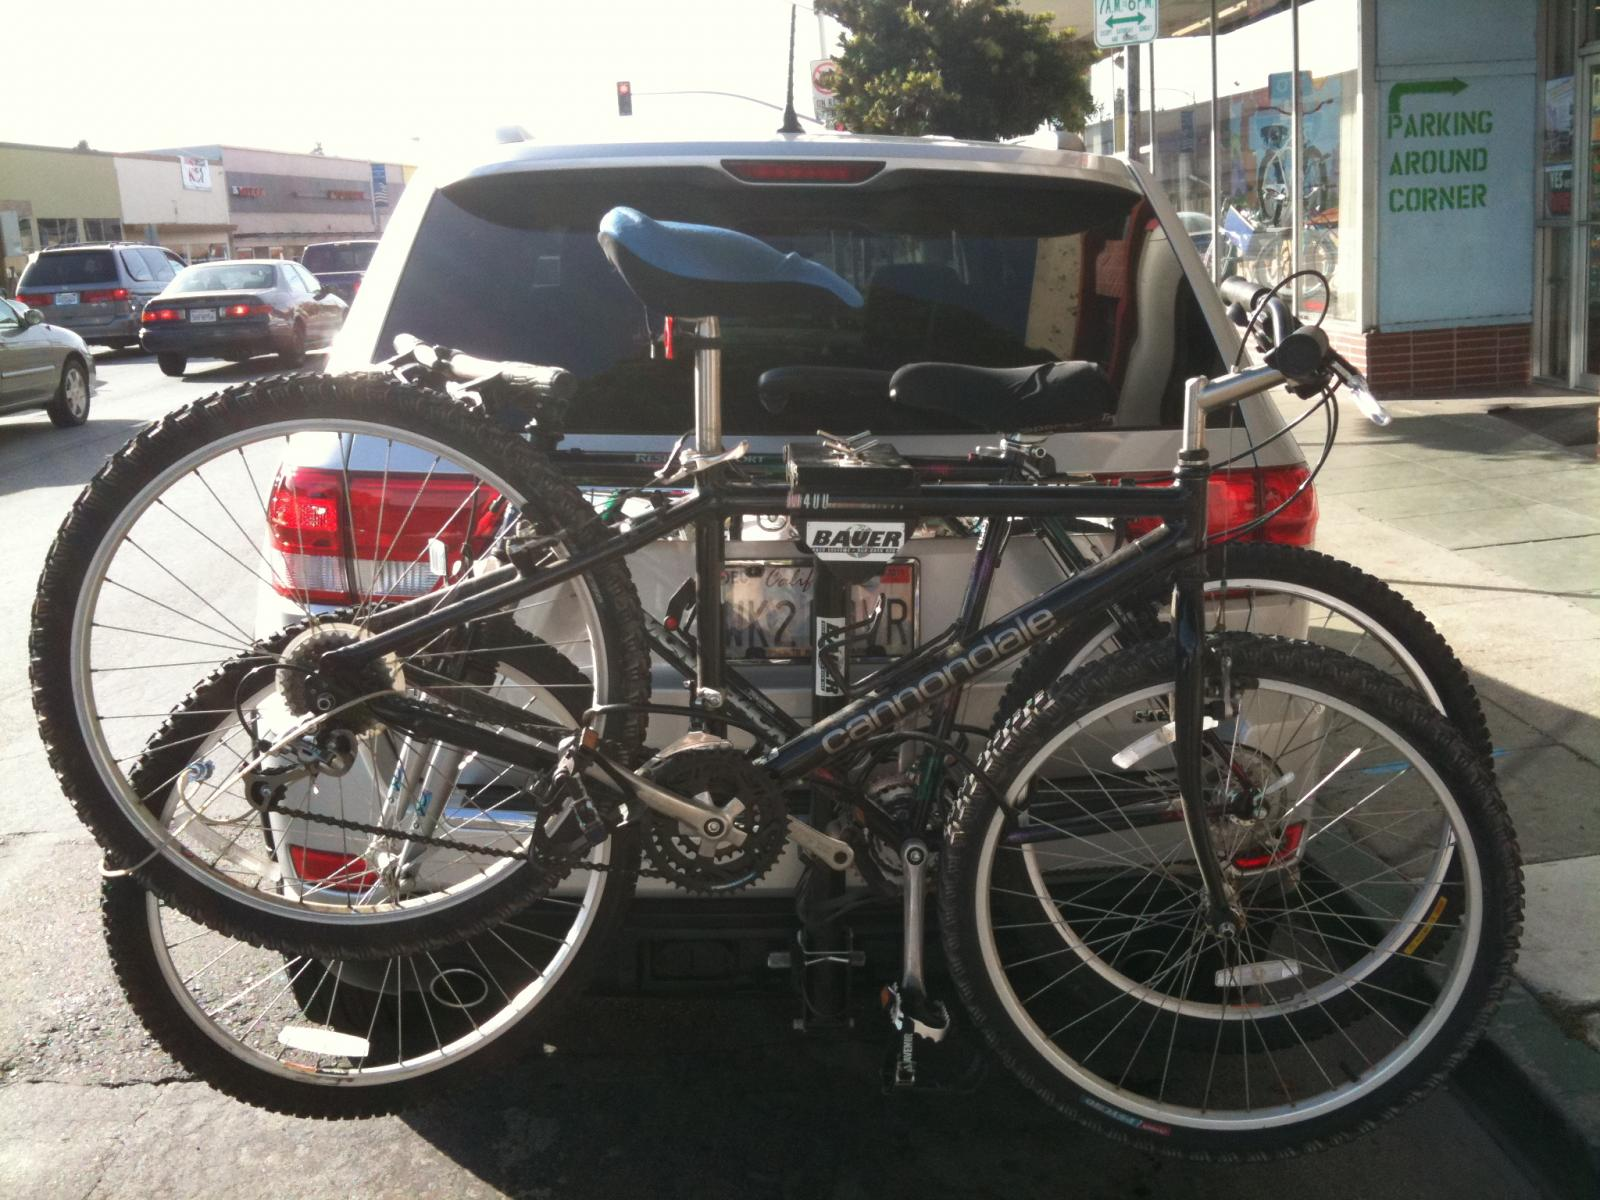 Bike rack from '93 Grand Cherokee